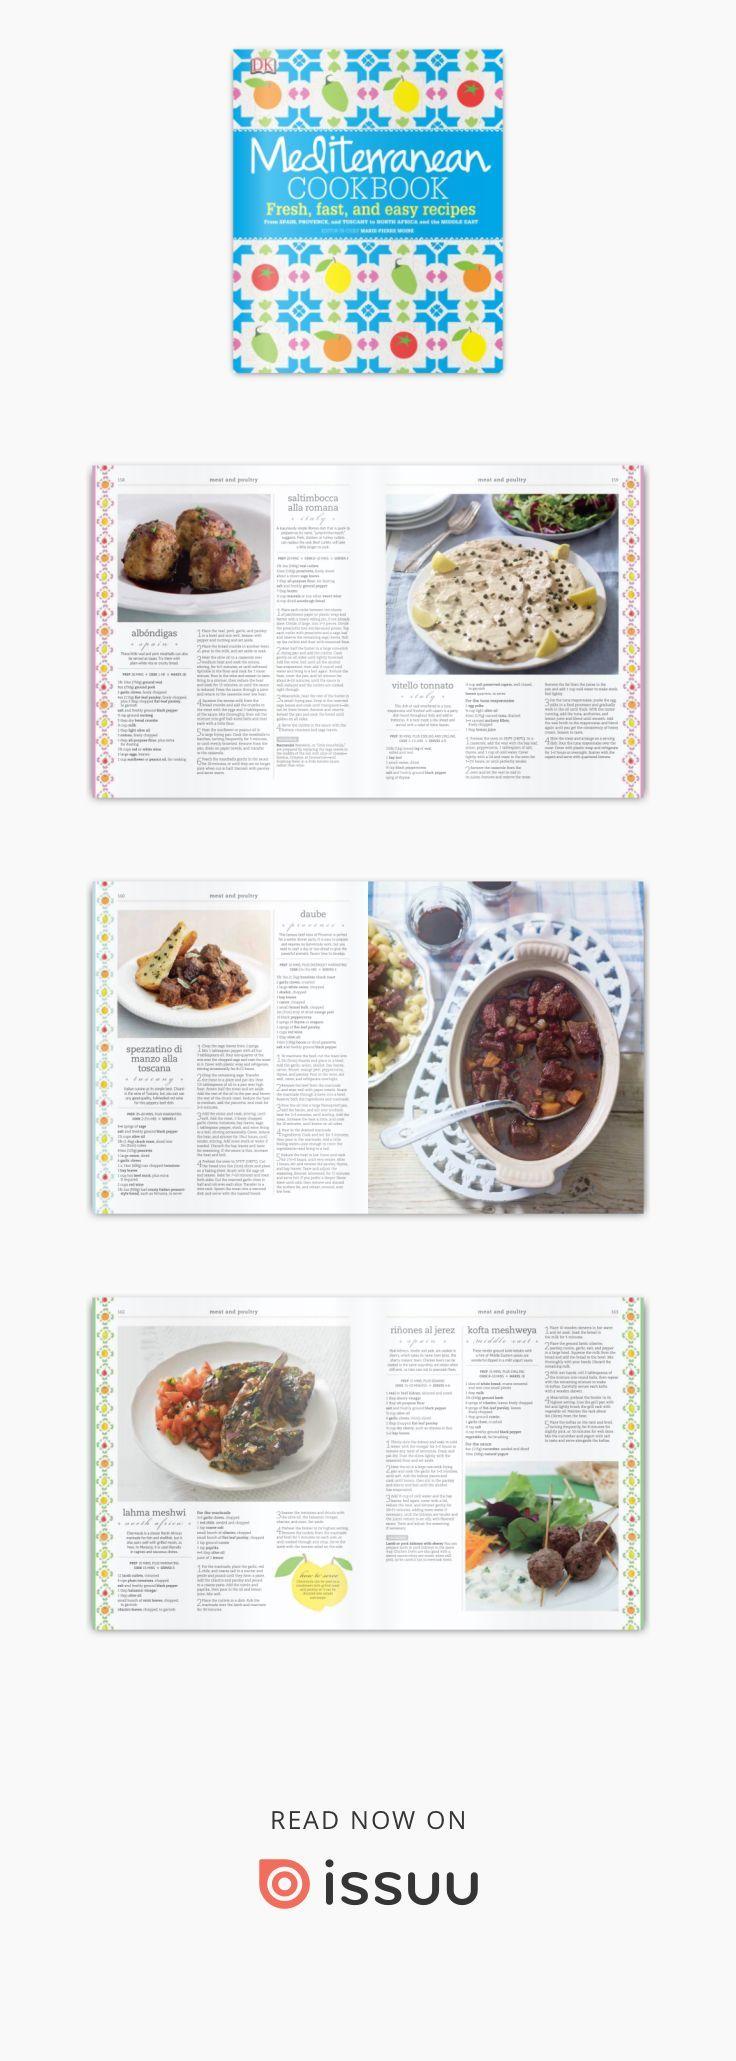 Moine m p mediterranean cookbook 2014